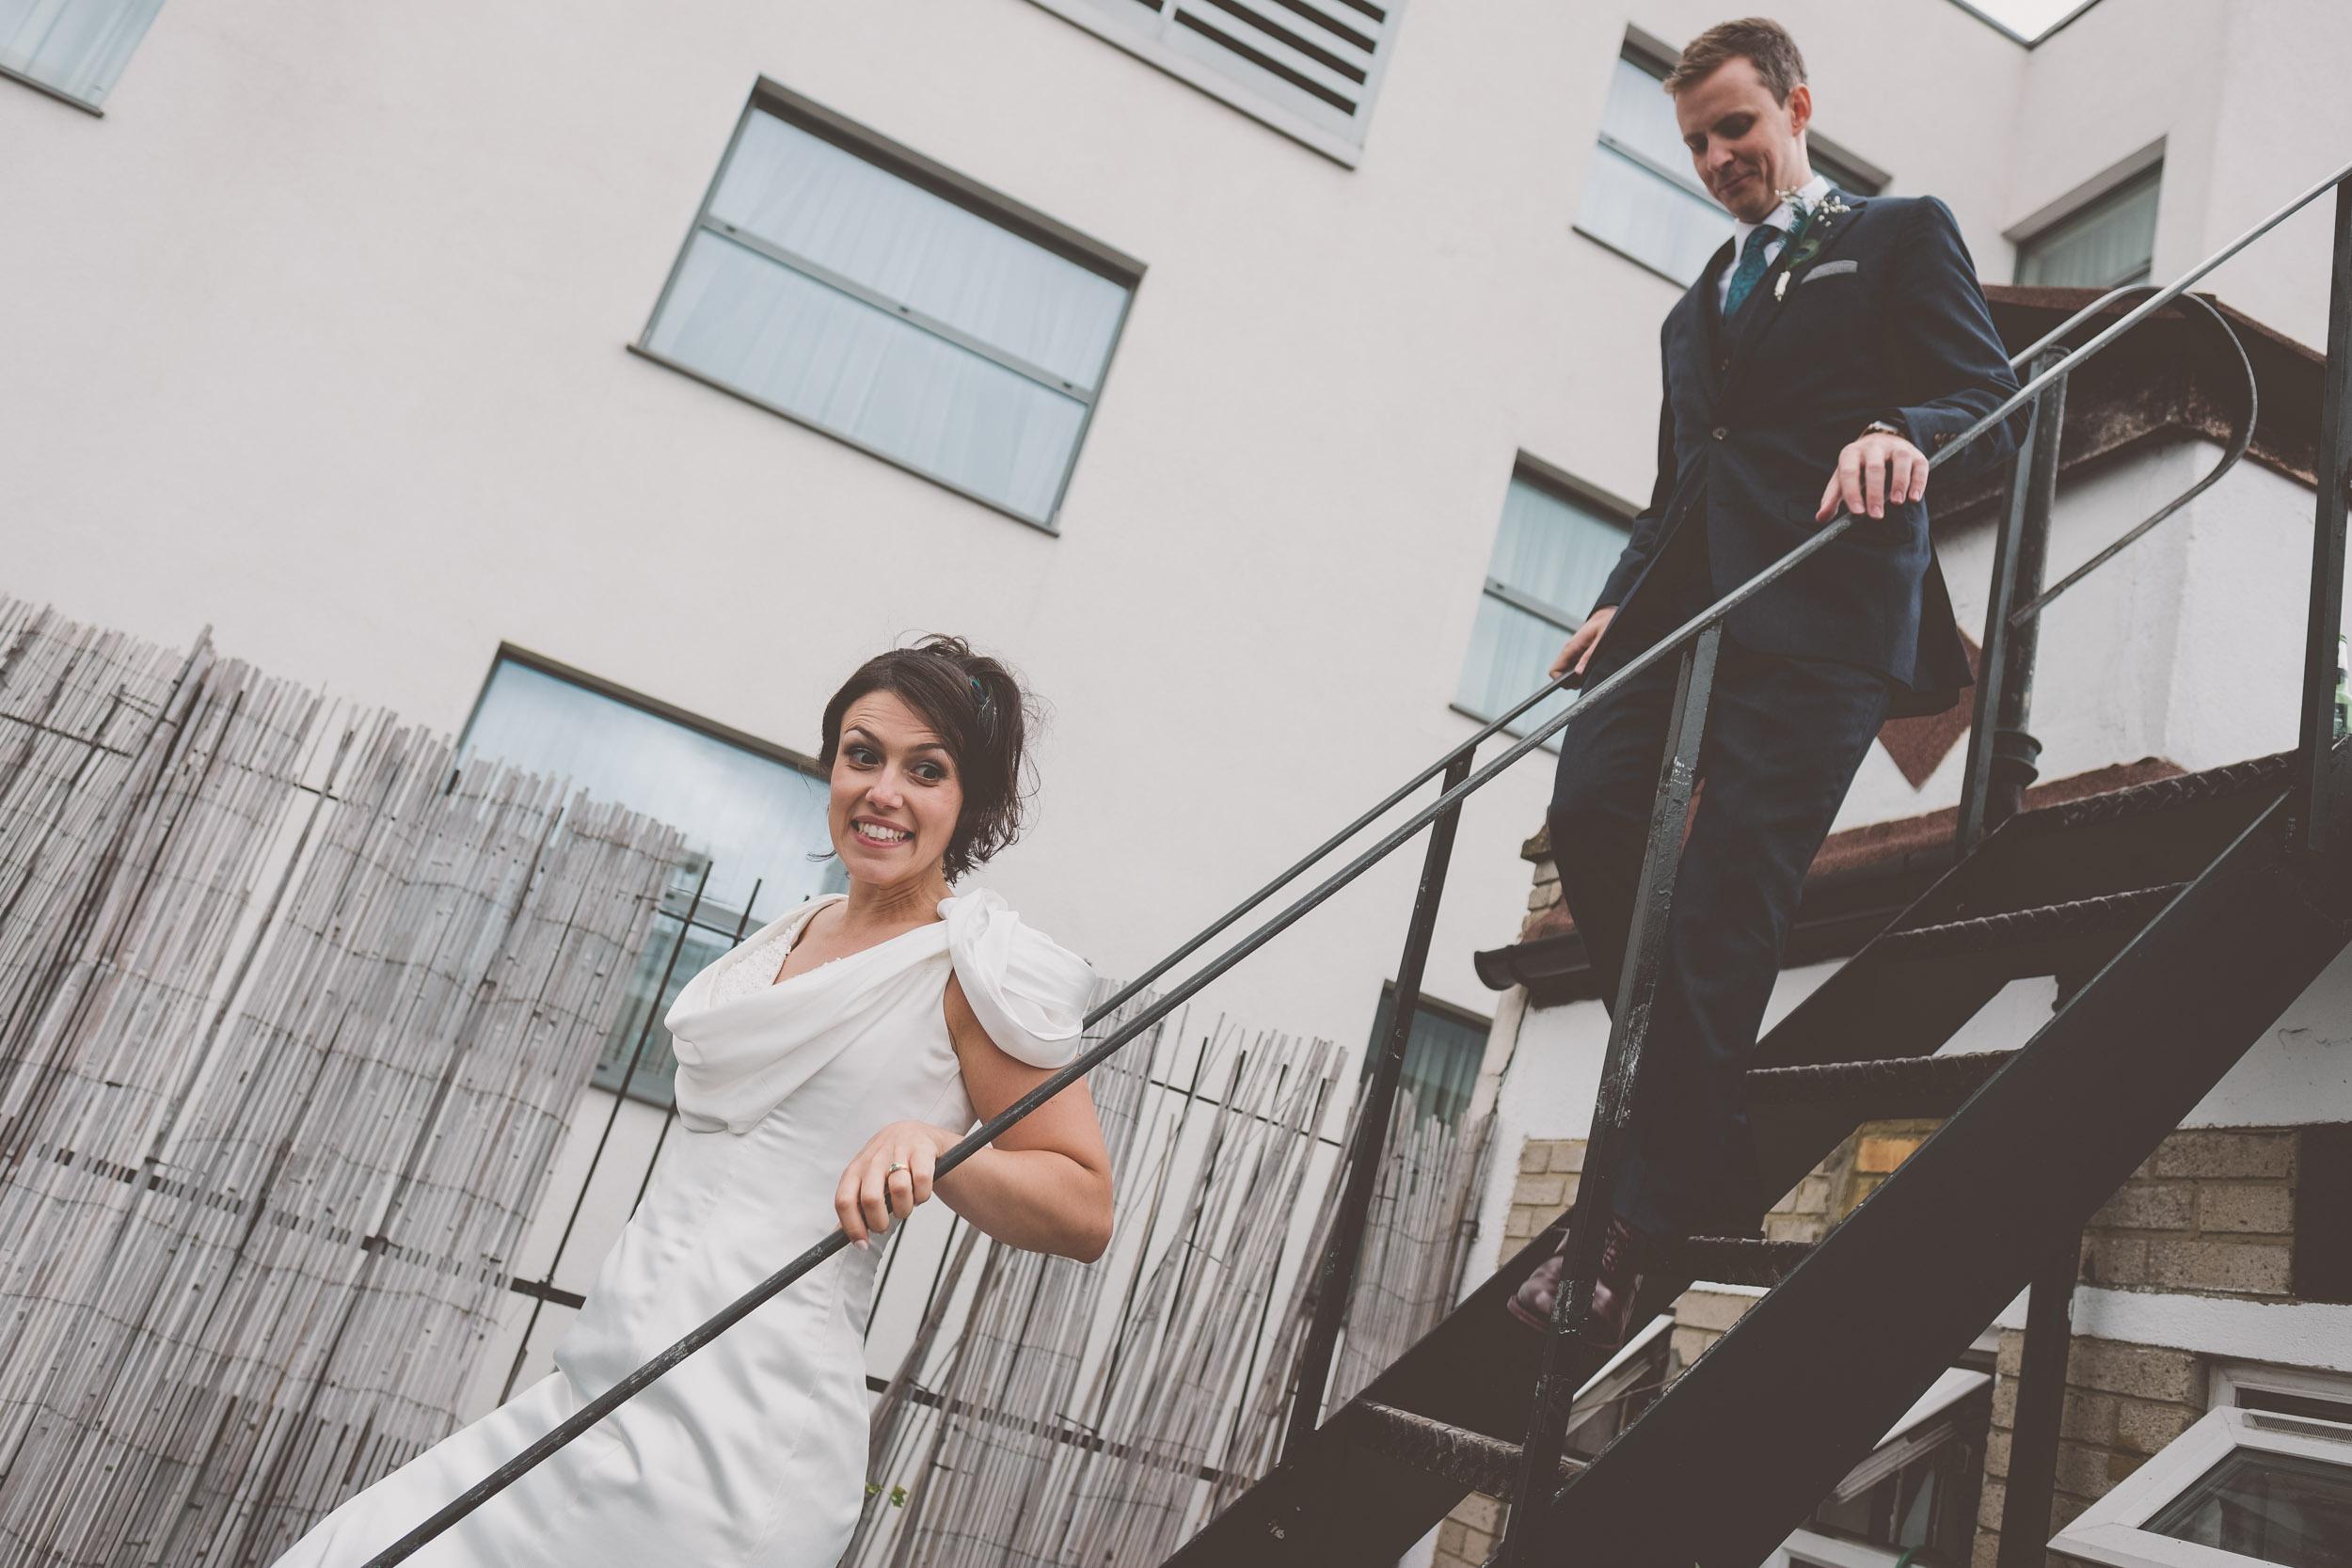 islington-town-hall-4th-floor-studios-wedding302.jpg